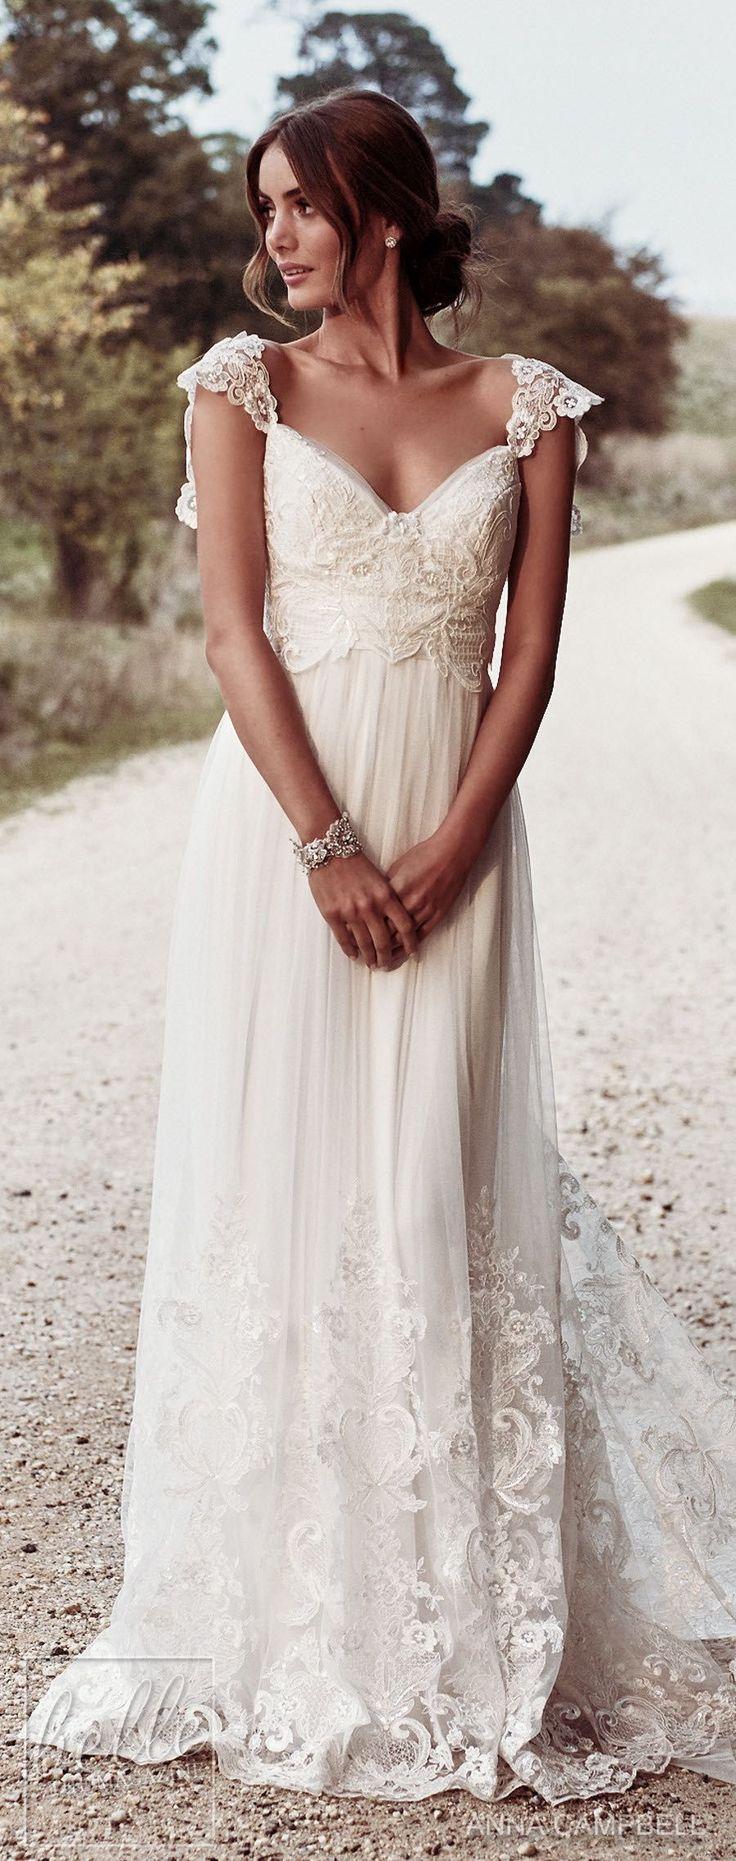 Wedding Dress by Anna Campbell Eternal Heart collection 2018 #laceweddingdresses